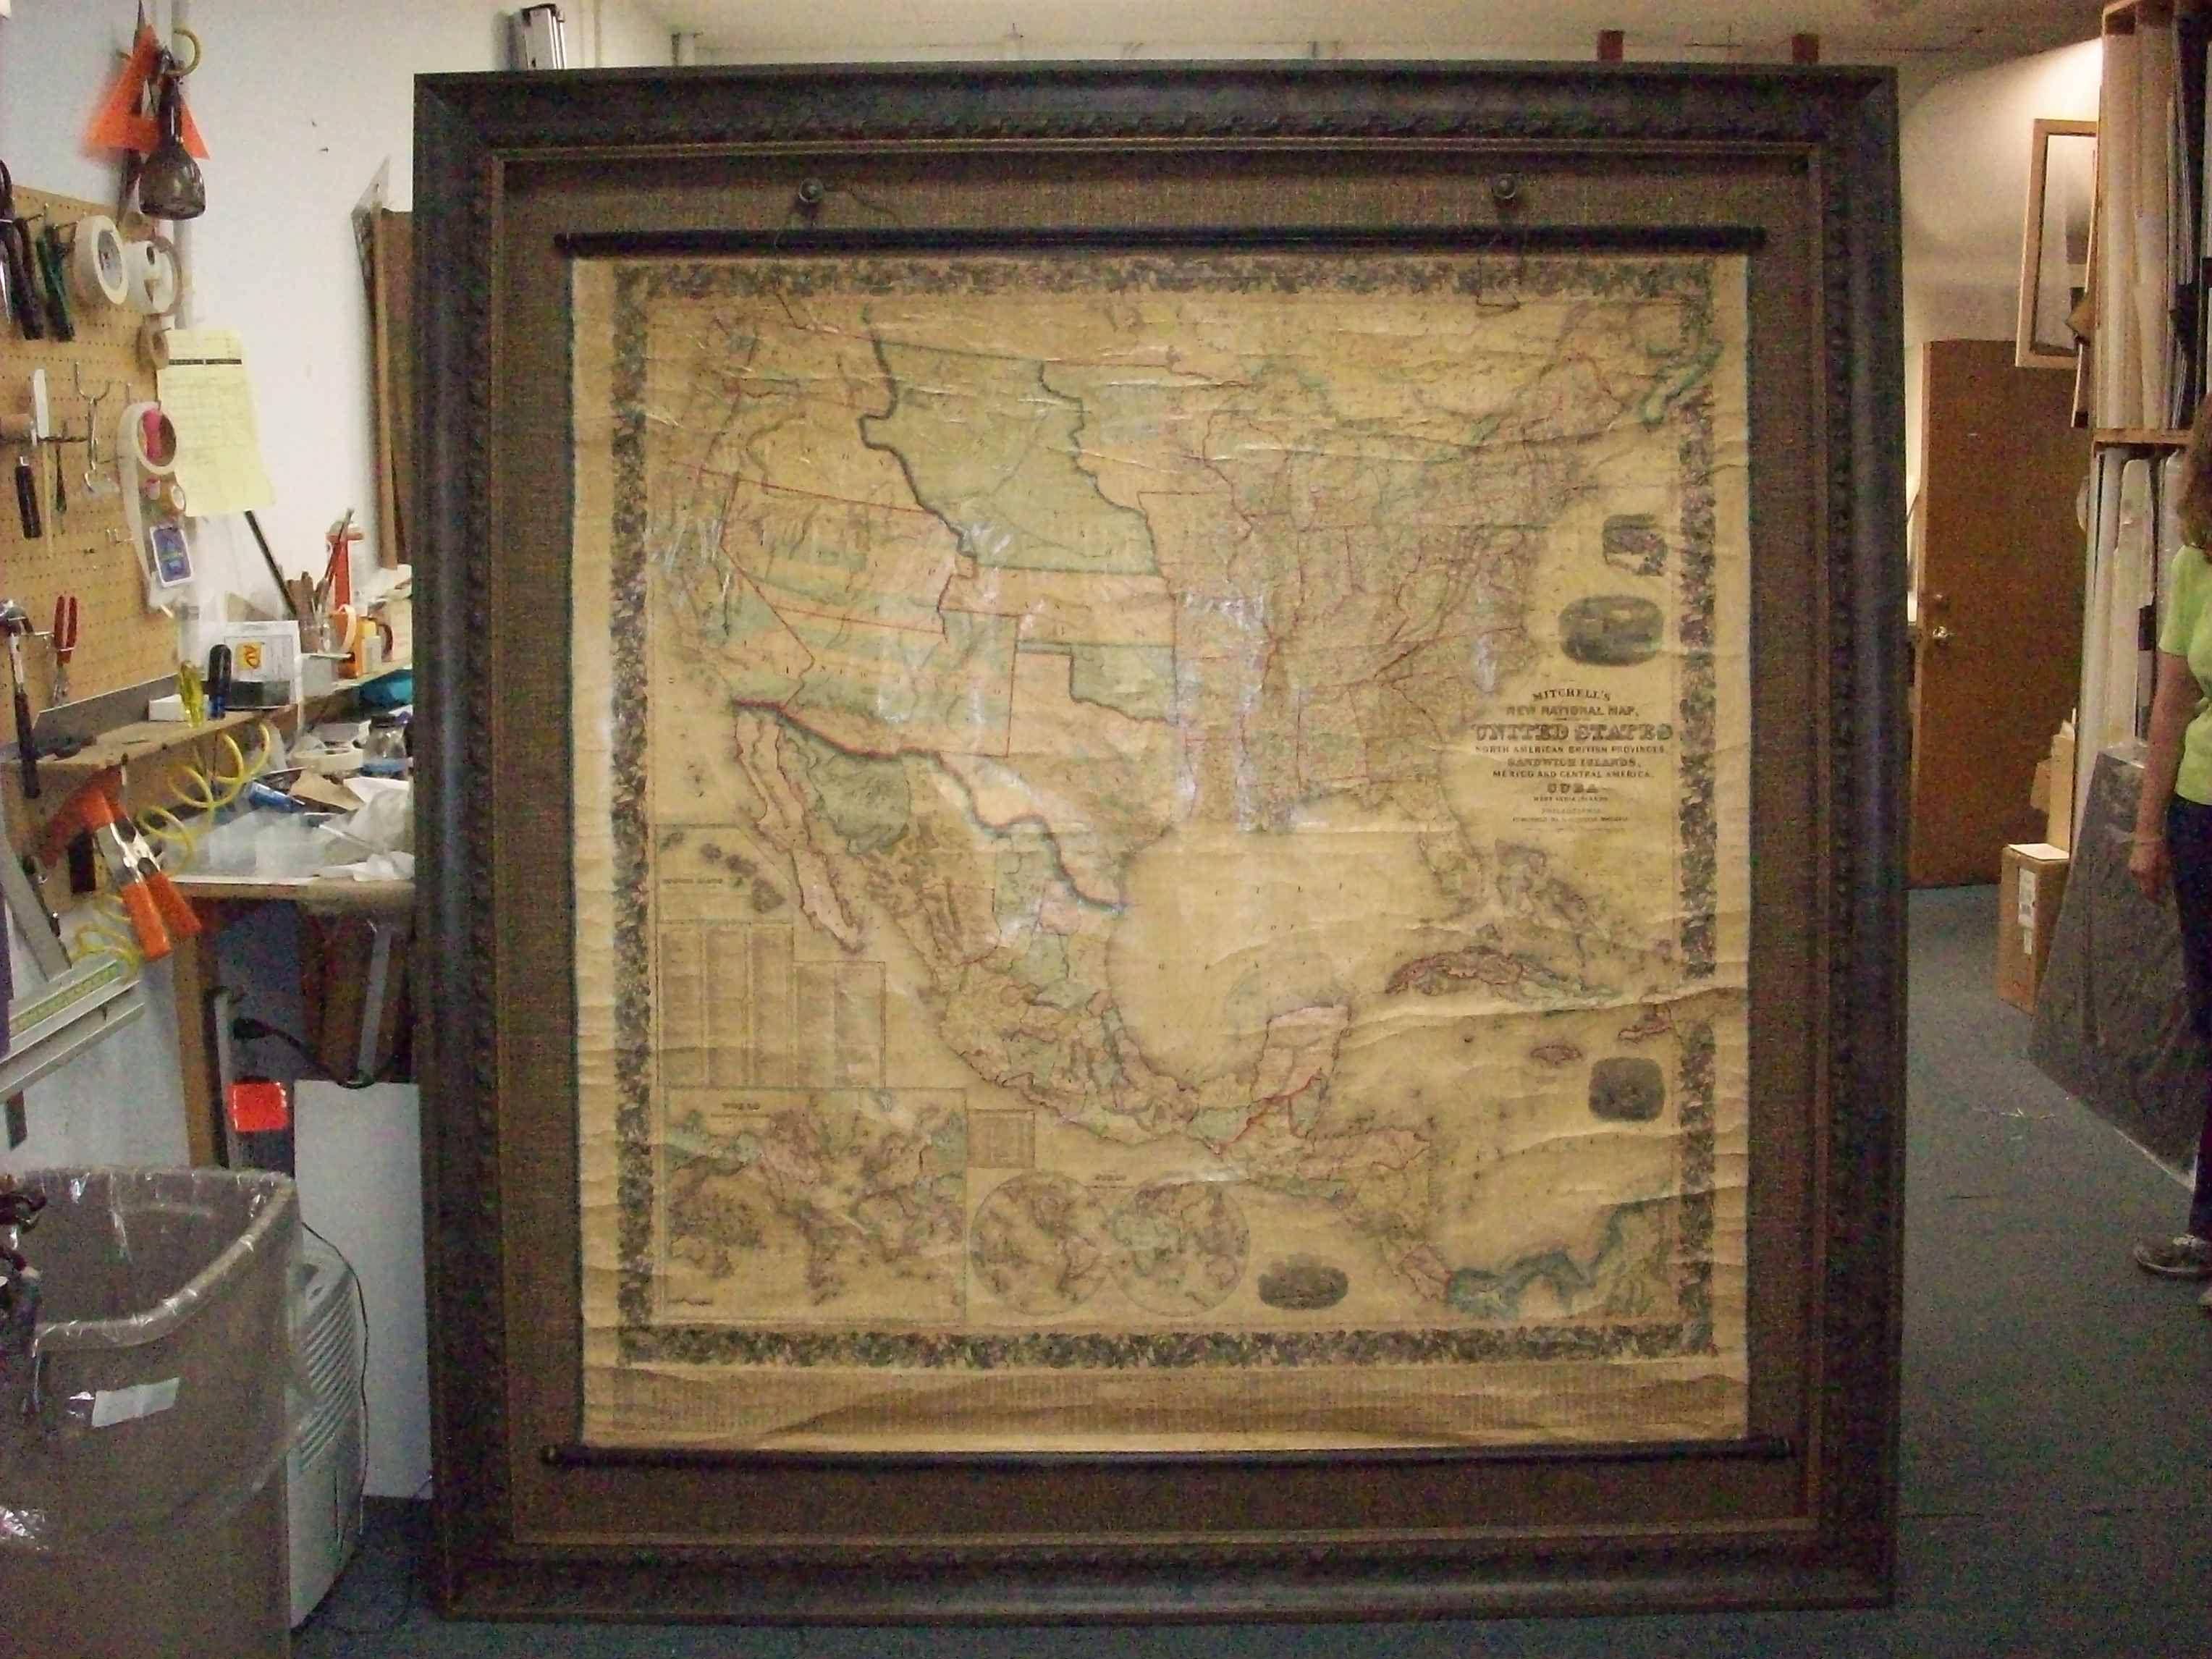 Gigantic Framed Antique US Wall Map Inspirational Framing - Framed us wall map